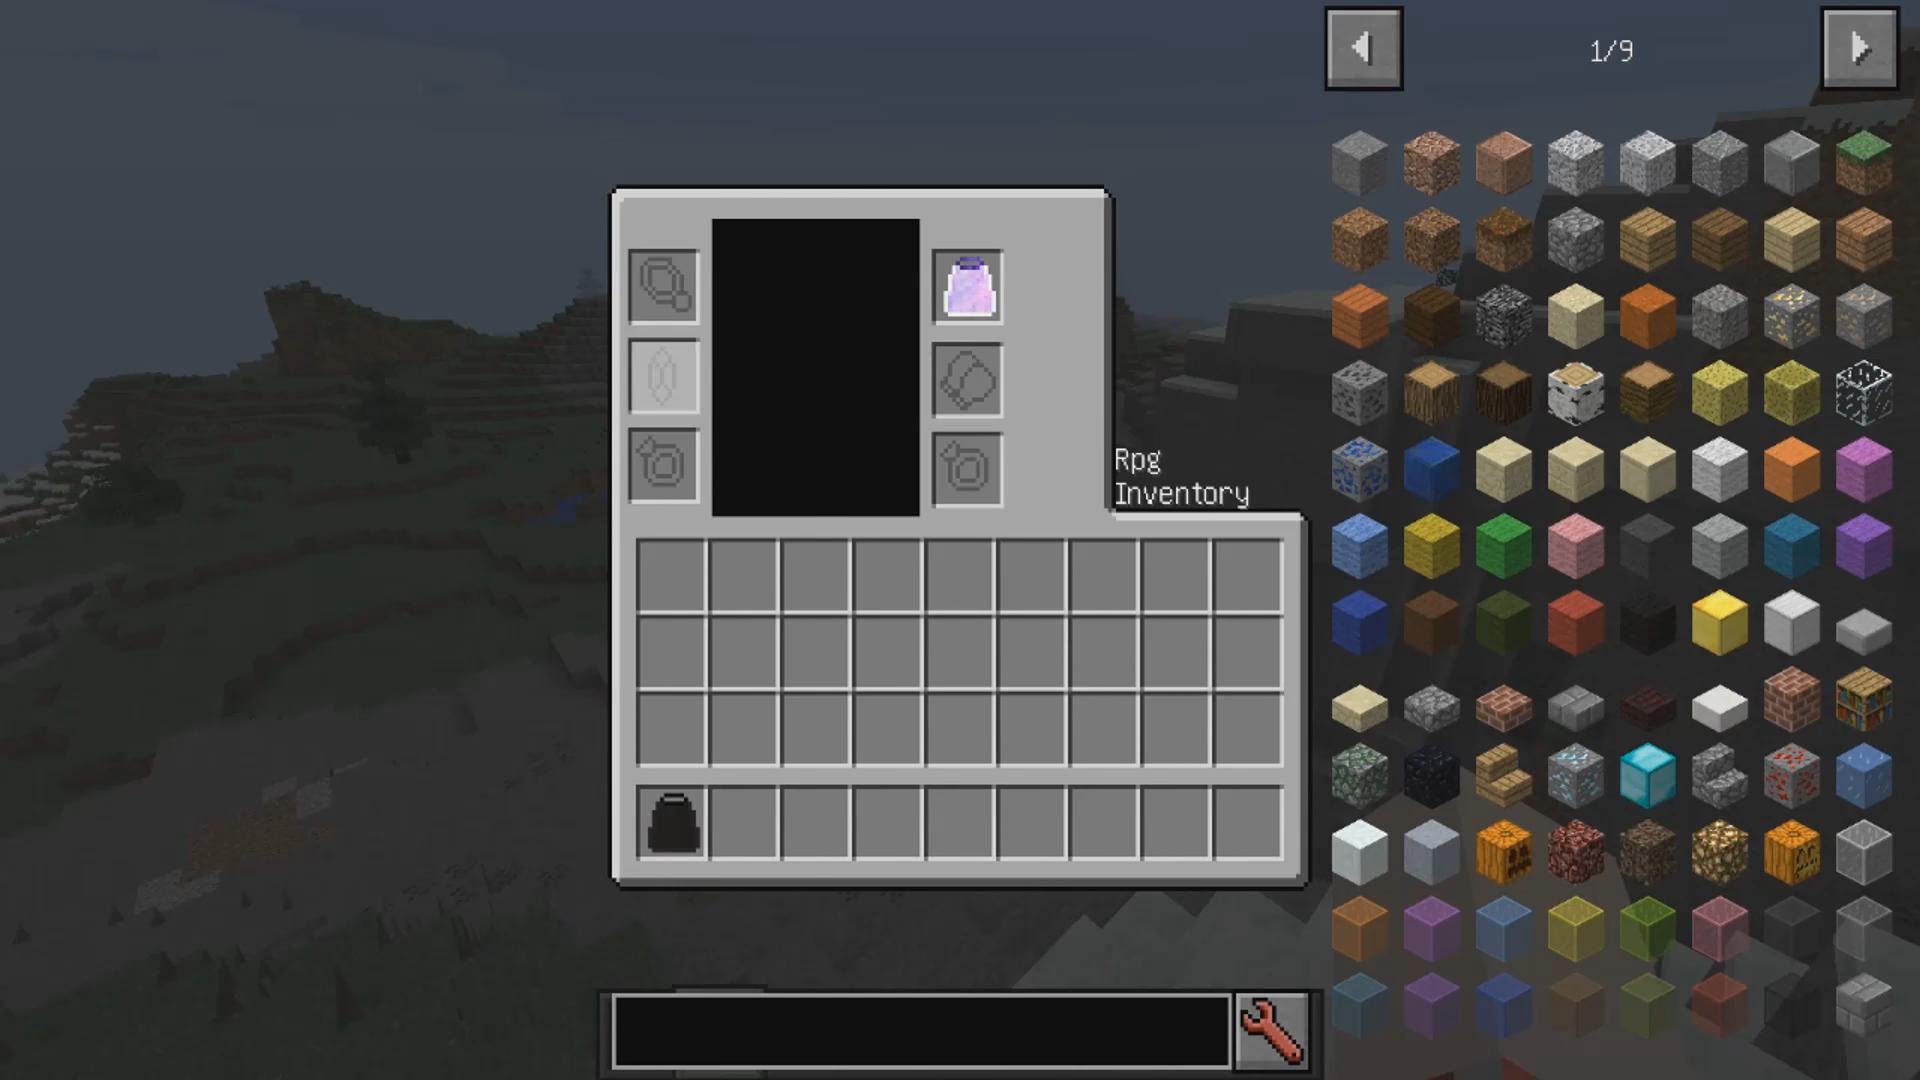 Мод «Rpg Inventory» (Прокачка игрока) - скриншот 1